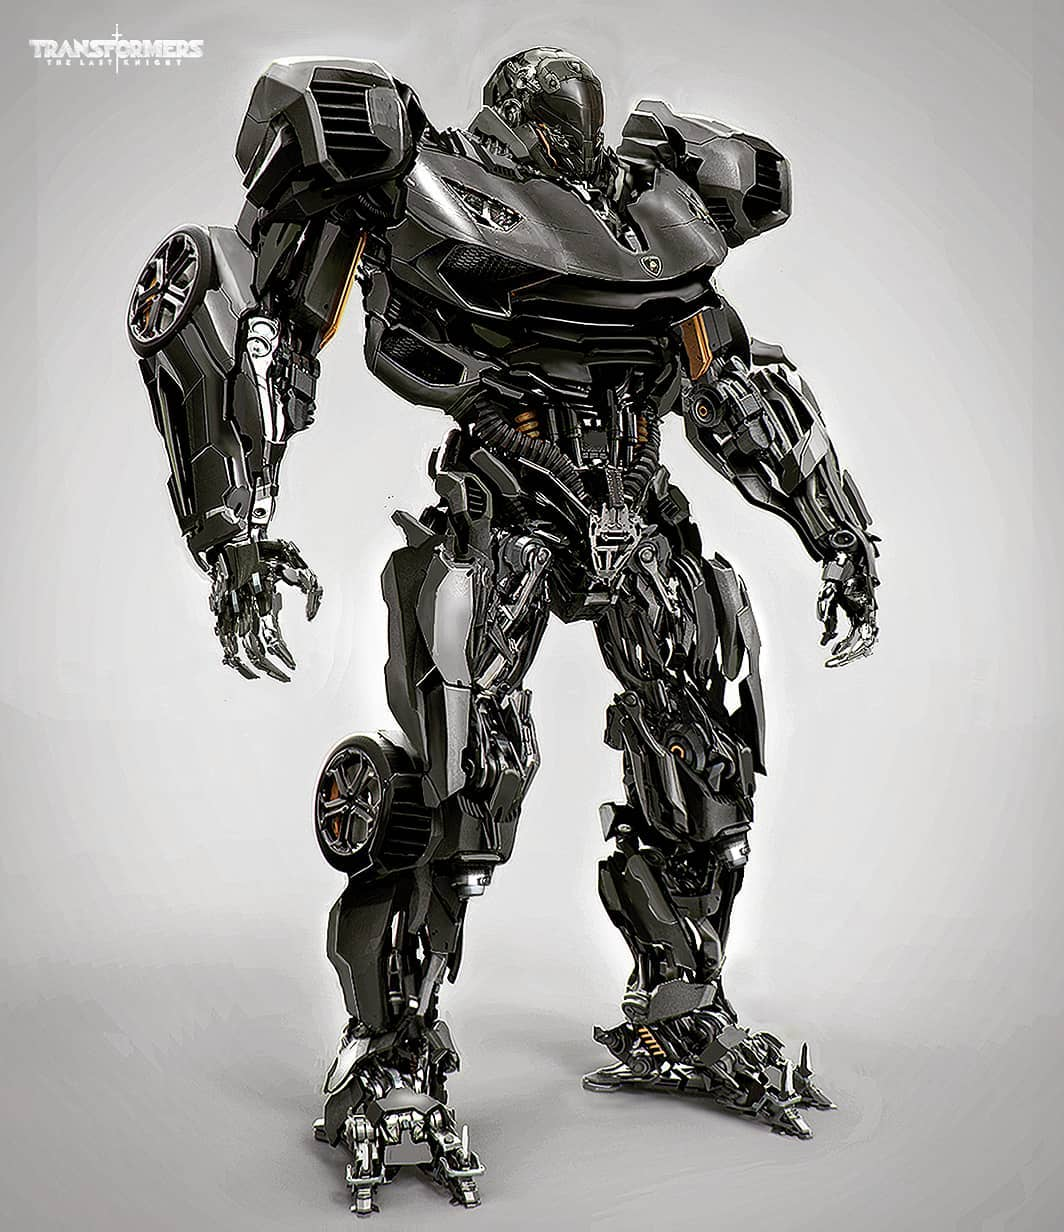 Transformers The Last Knight Concept Art: Hot Rod, Megatron & Decepticon Spaceship ...